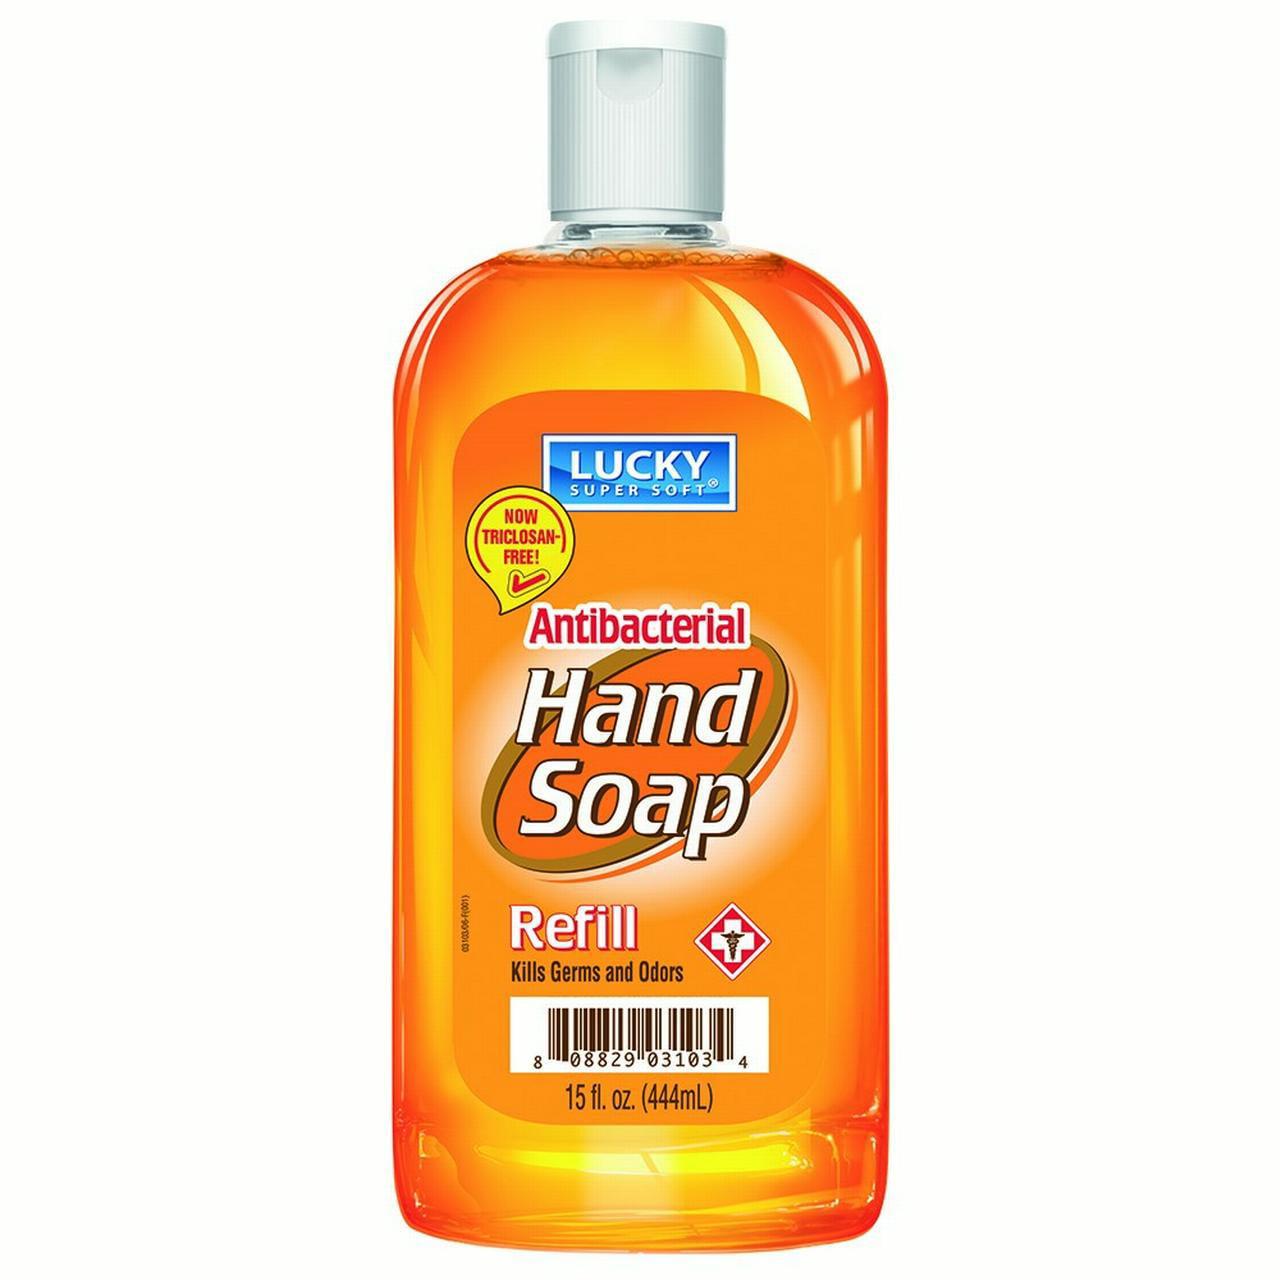 Lucky Super Soft Antibacterial Hand Soap Refill, 15 Oz